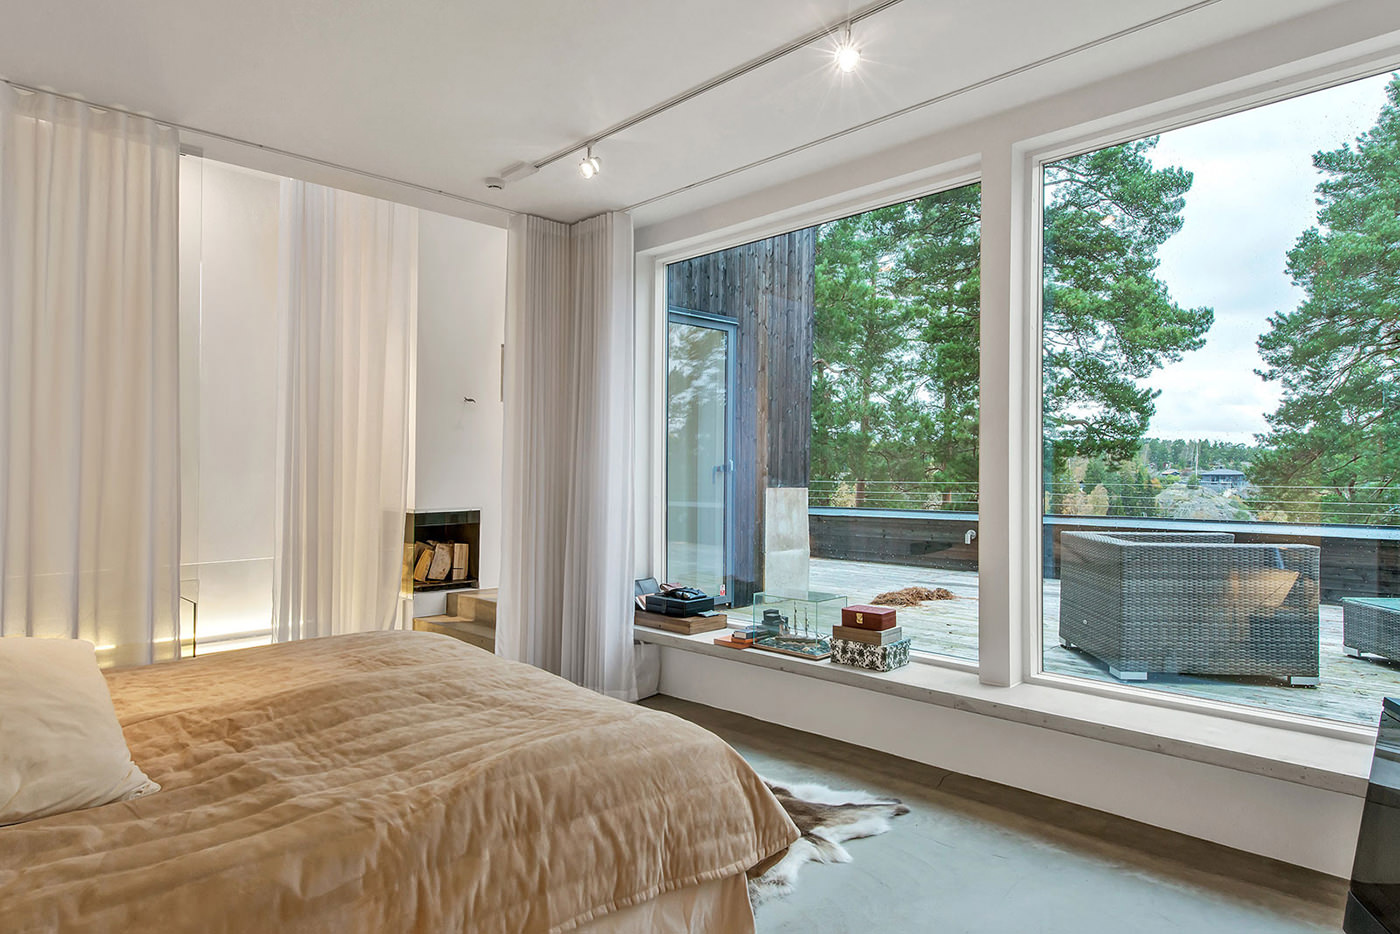 http://design-homes.ru/images/galery/1235/dizajn-interera-s-panoramnymi-oknami11.jpg